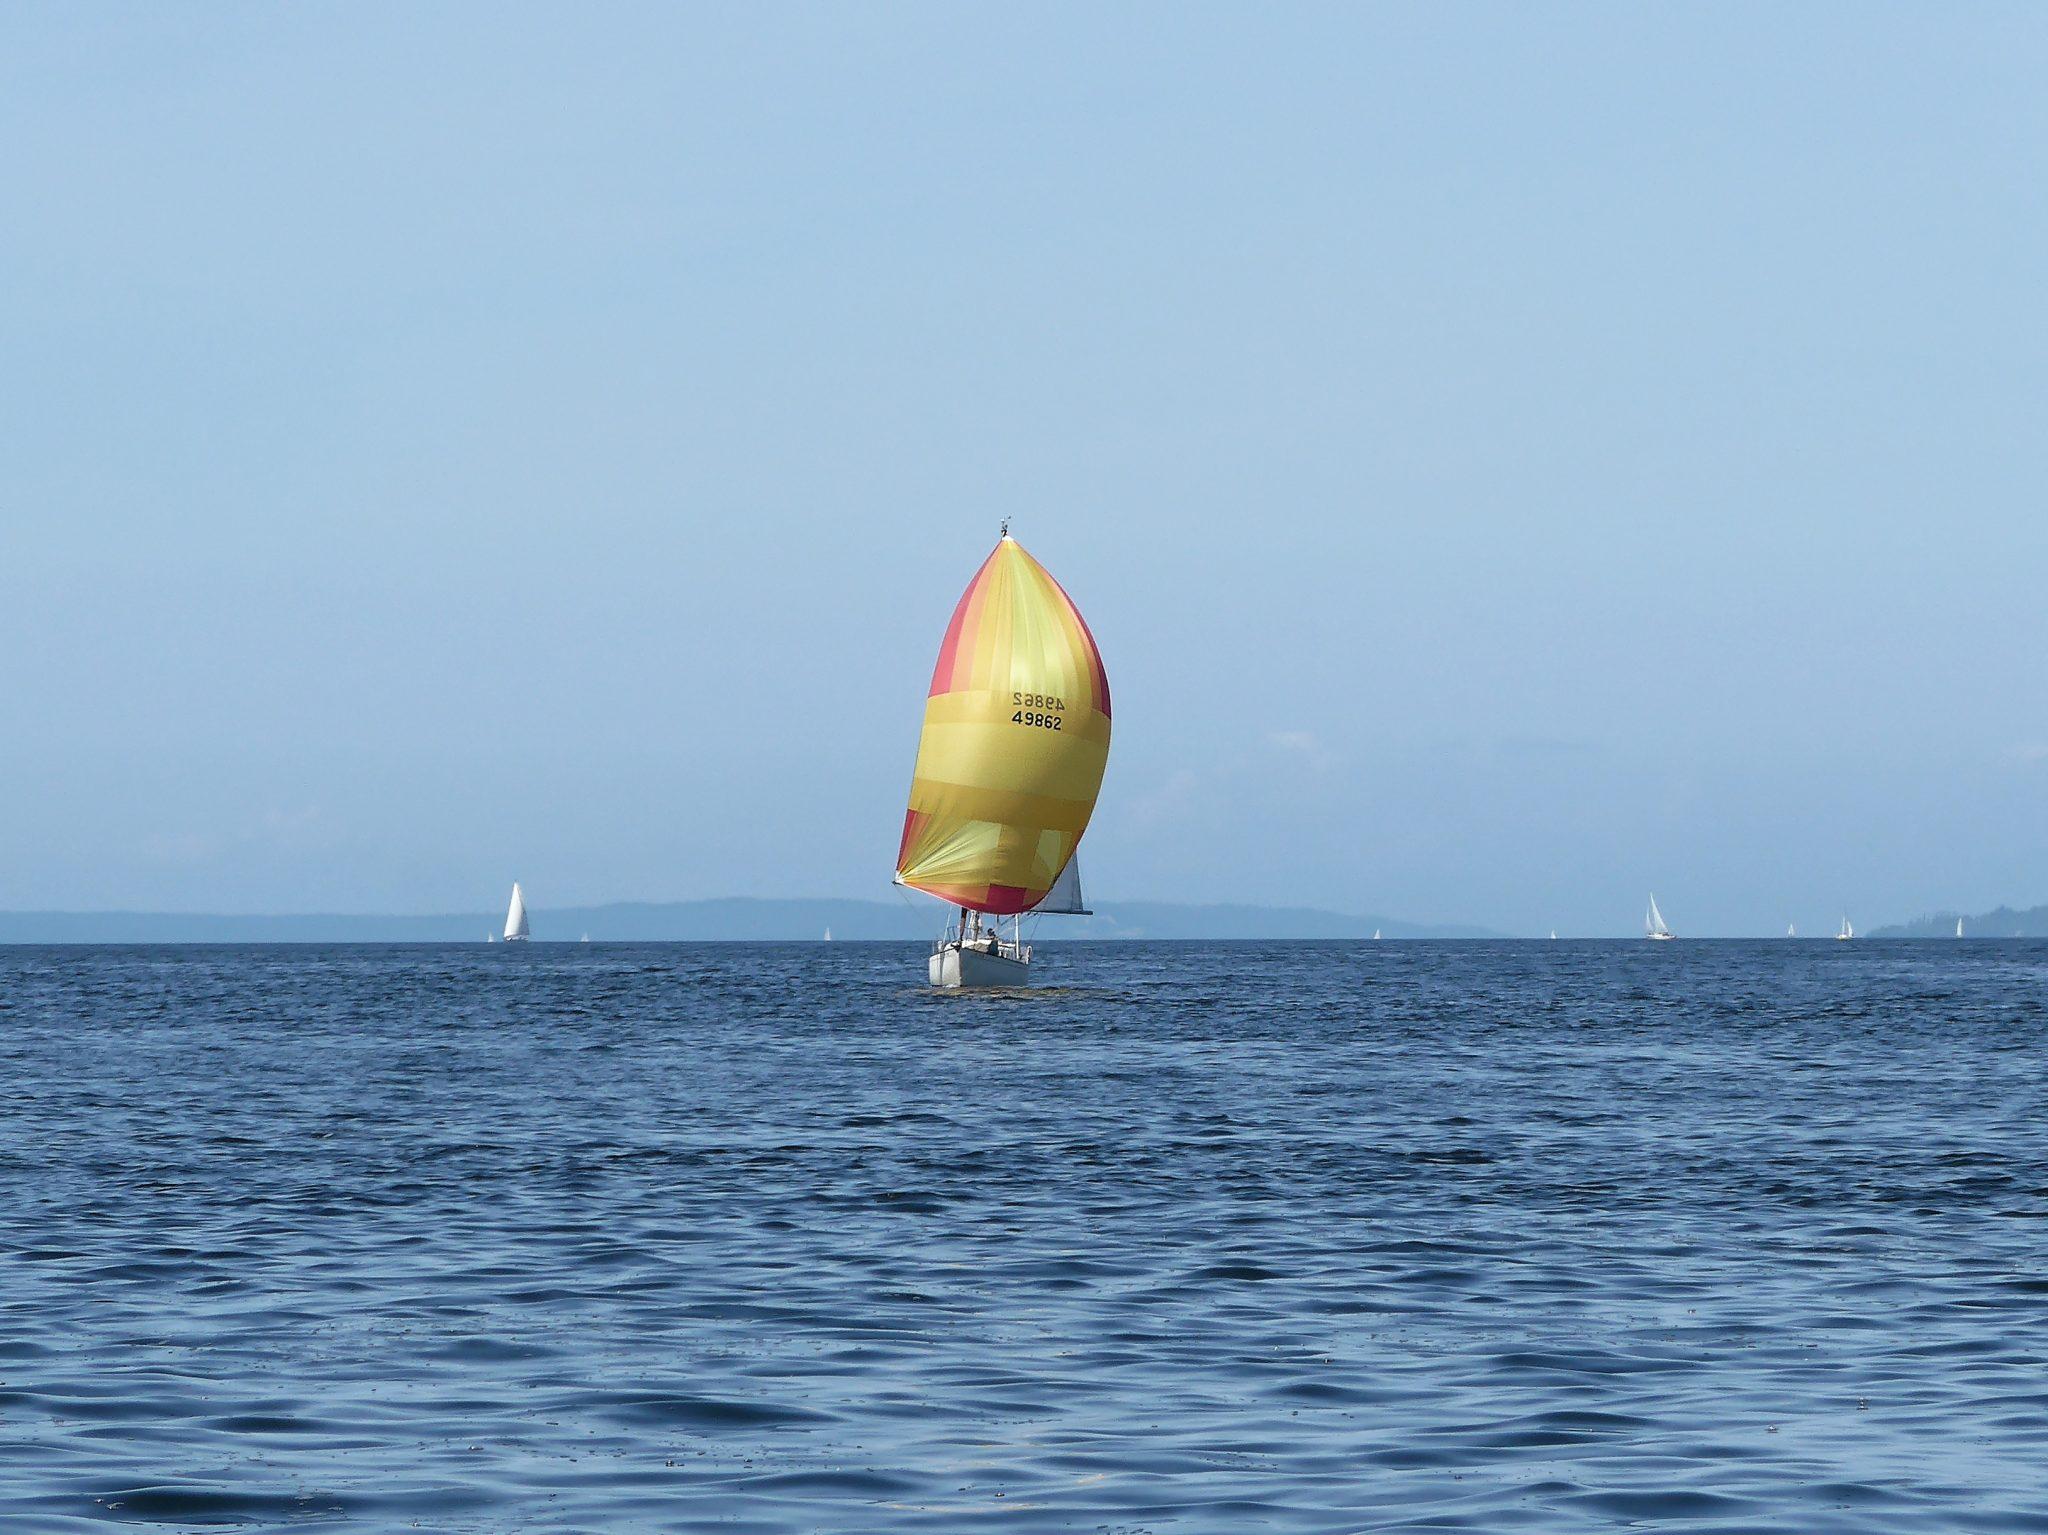 sailboat spinnaker on way to winslow wharf marina